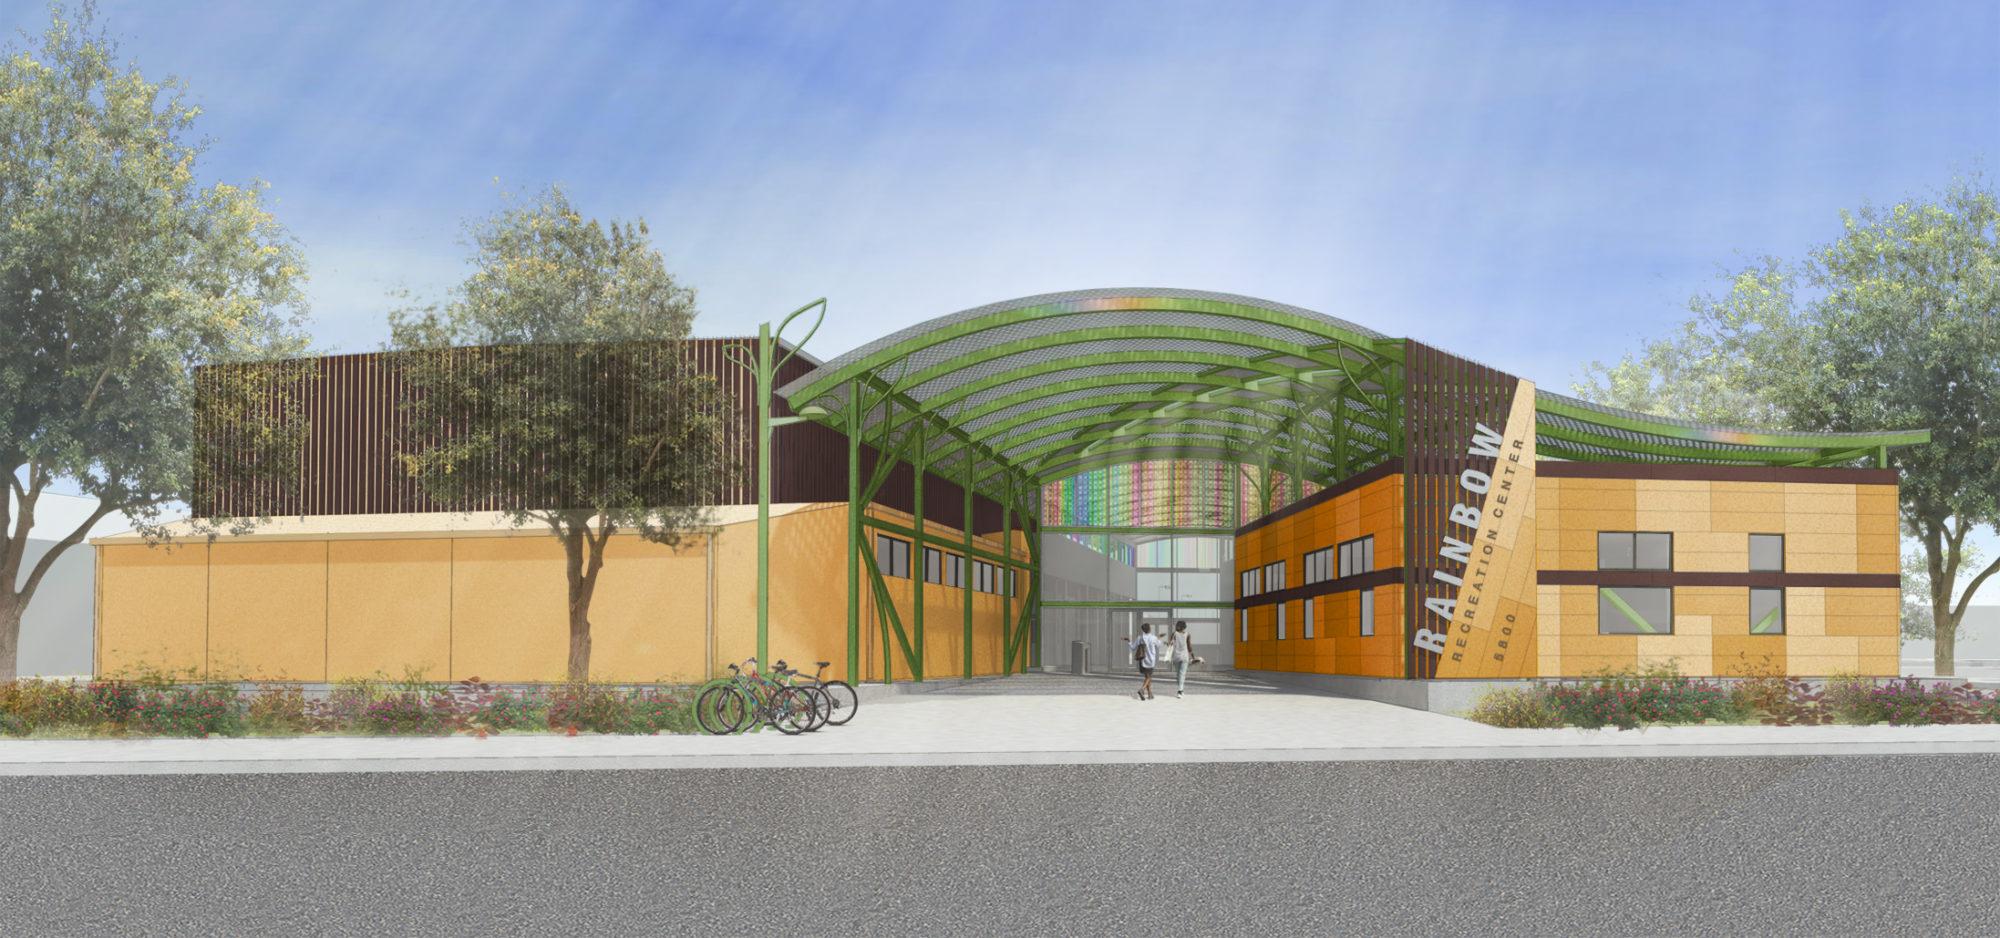 Rainbow Recreation Center Byrens Kim Design Works